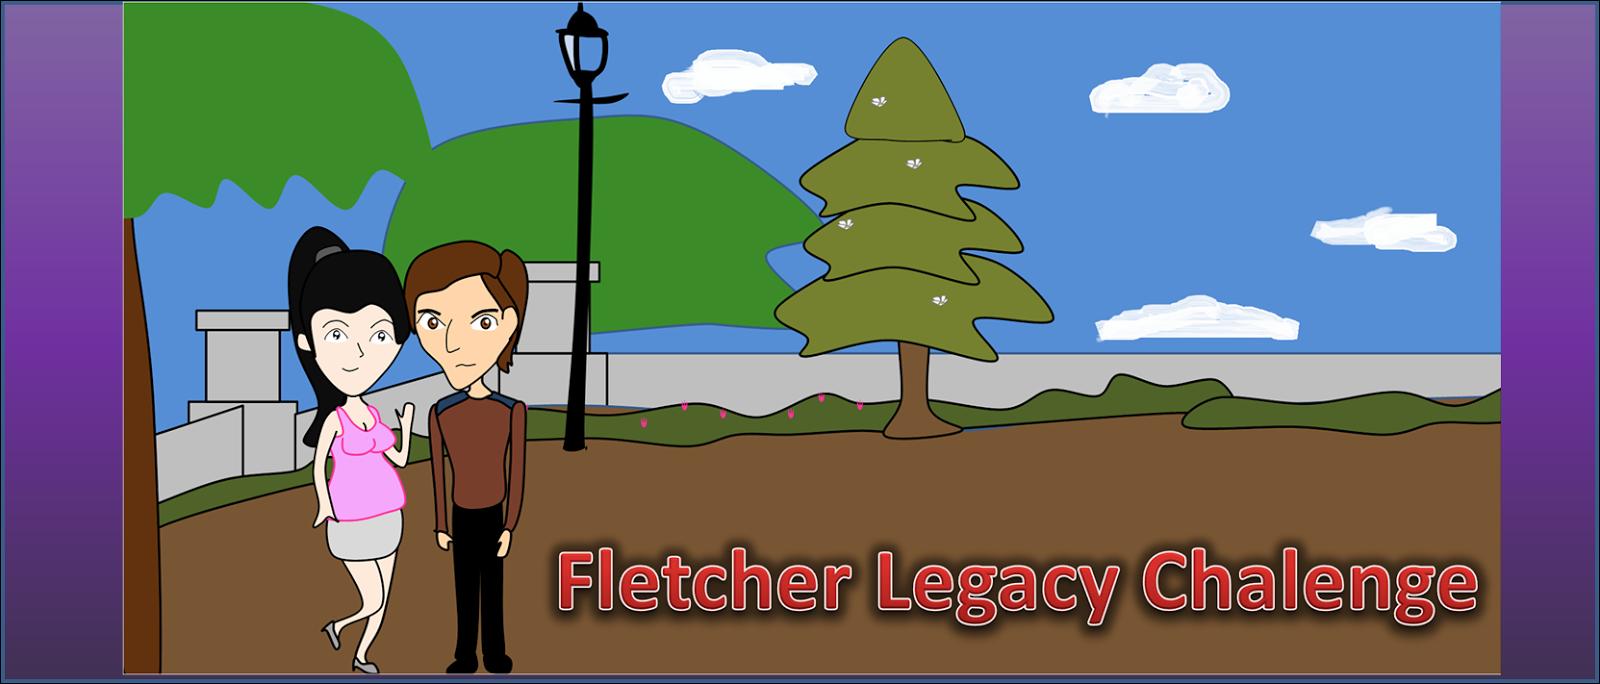 fletcher legacy generation 1 logo